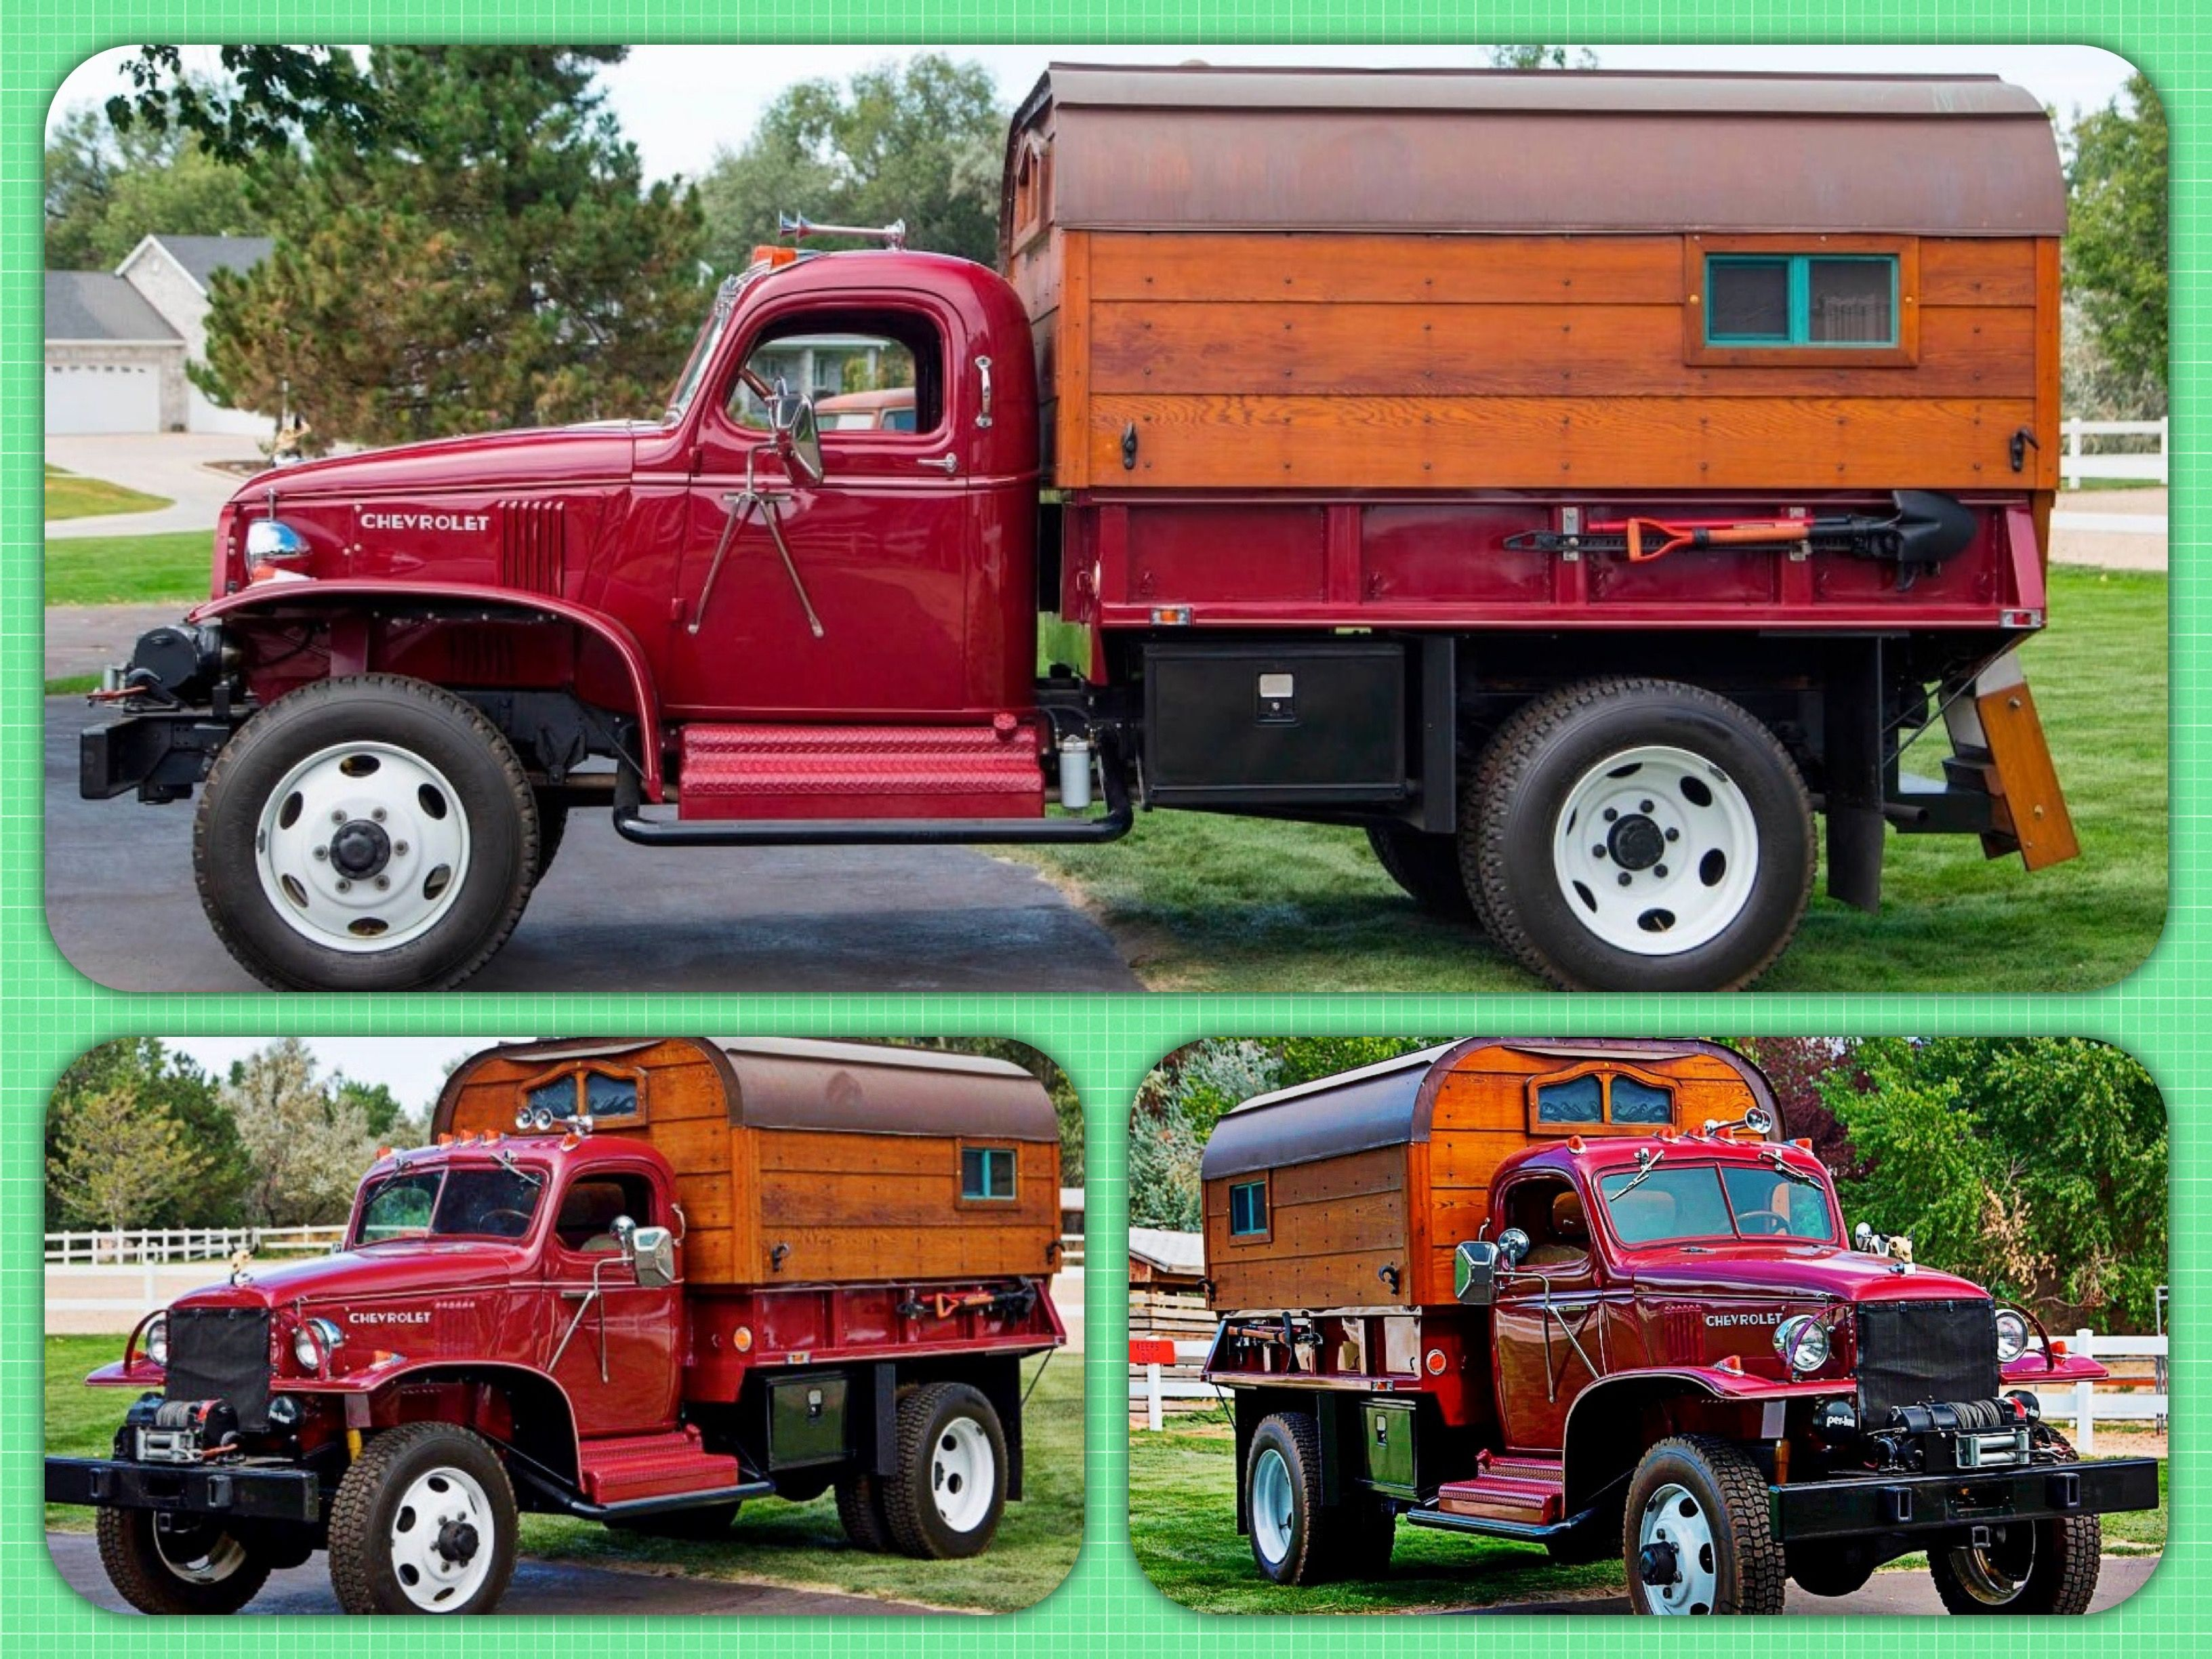 Dodge Ram Monster Truck 4x4 Overland Expedition Camper Cummins